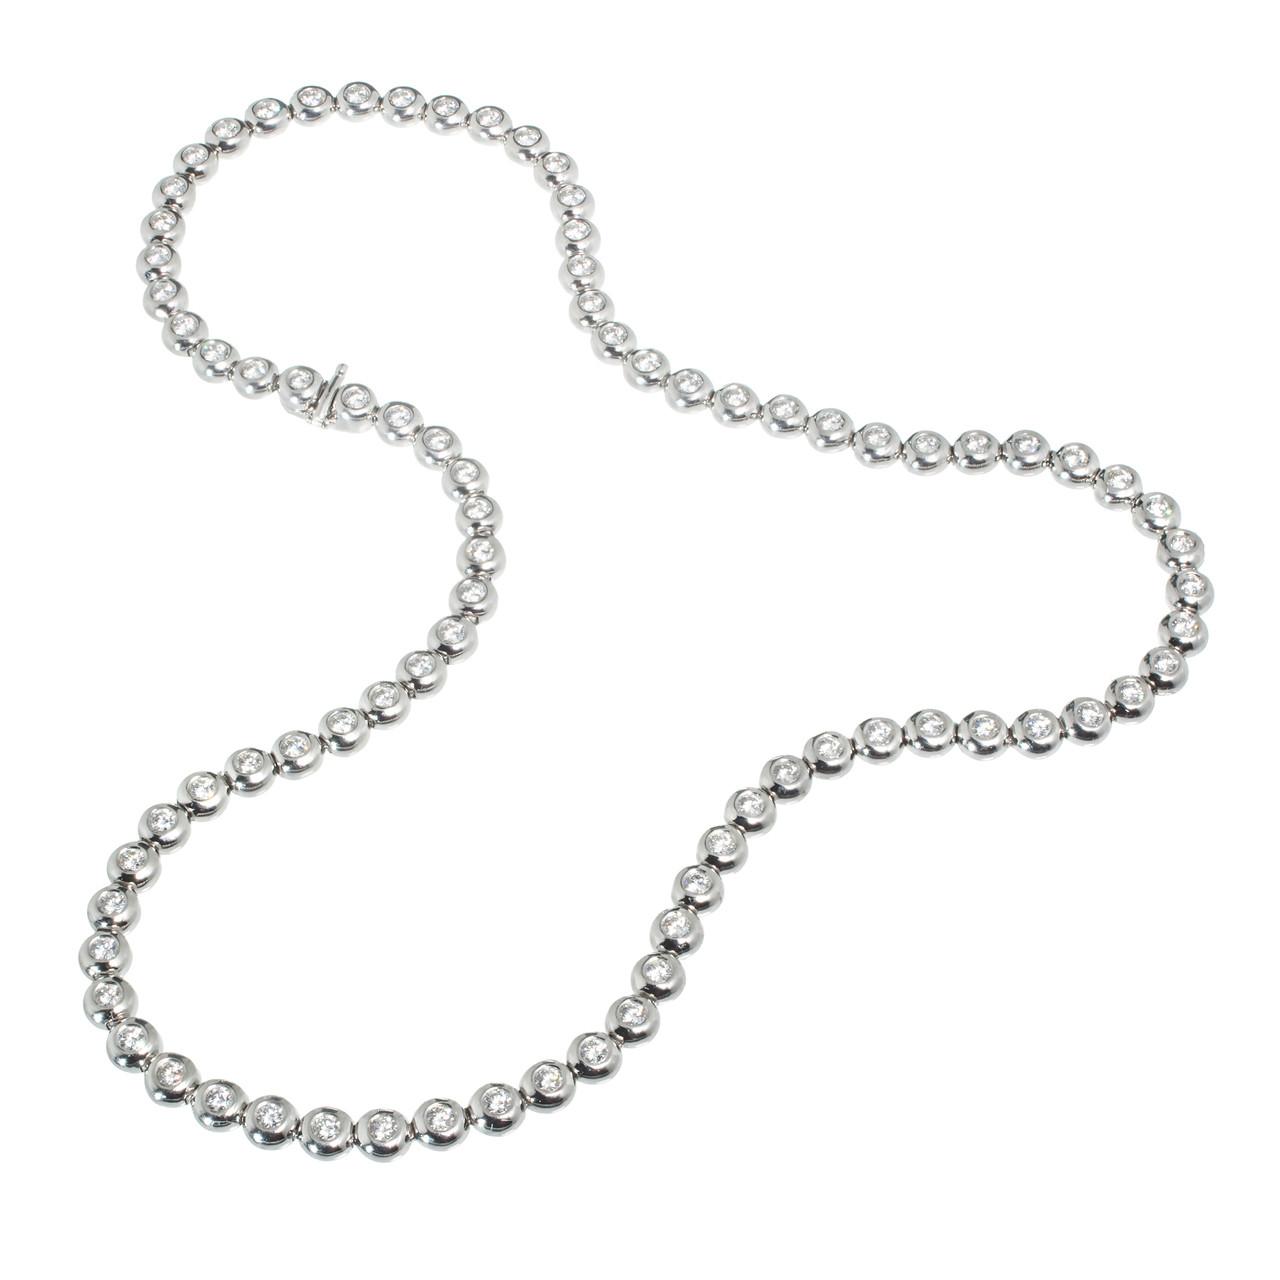 a3fd1e5fe Tiffany & Co. Diamond Platinum Bezel Set Tennis Necklace -  petersuchyjewelers